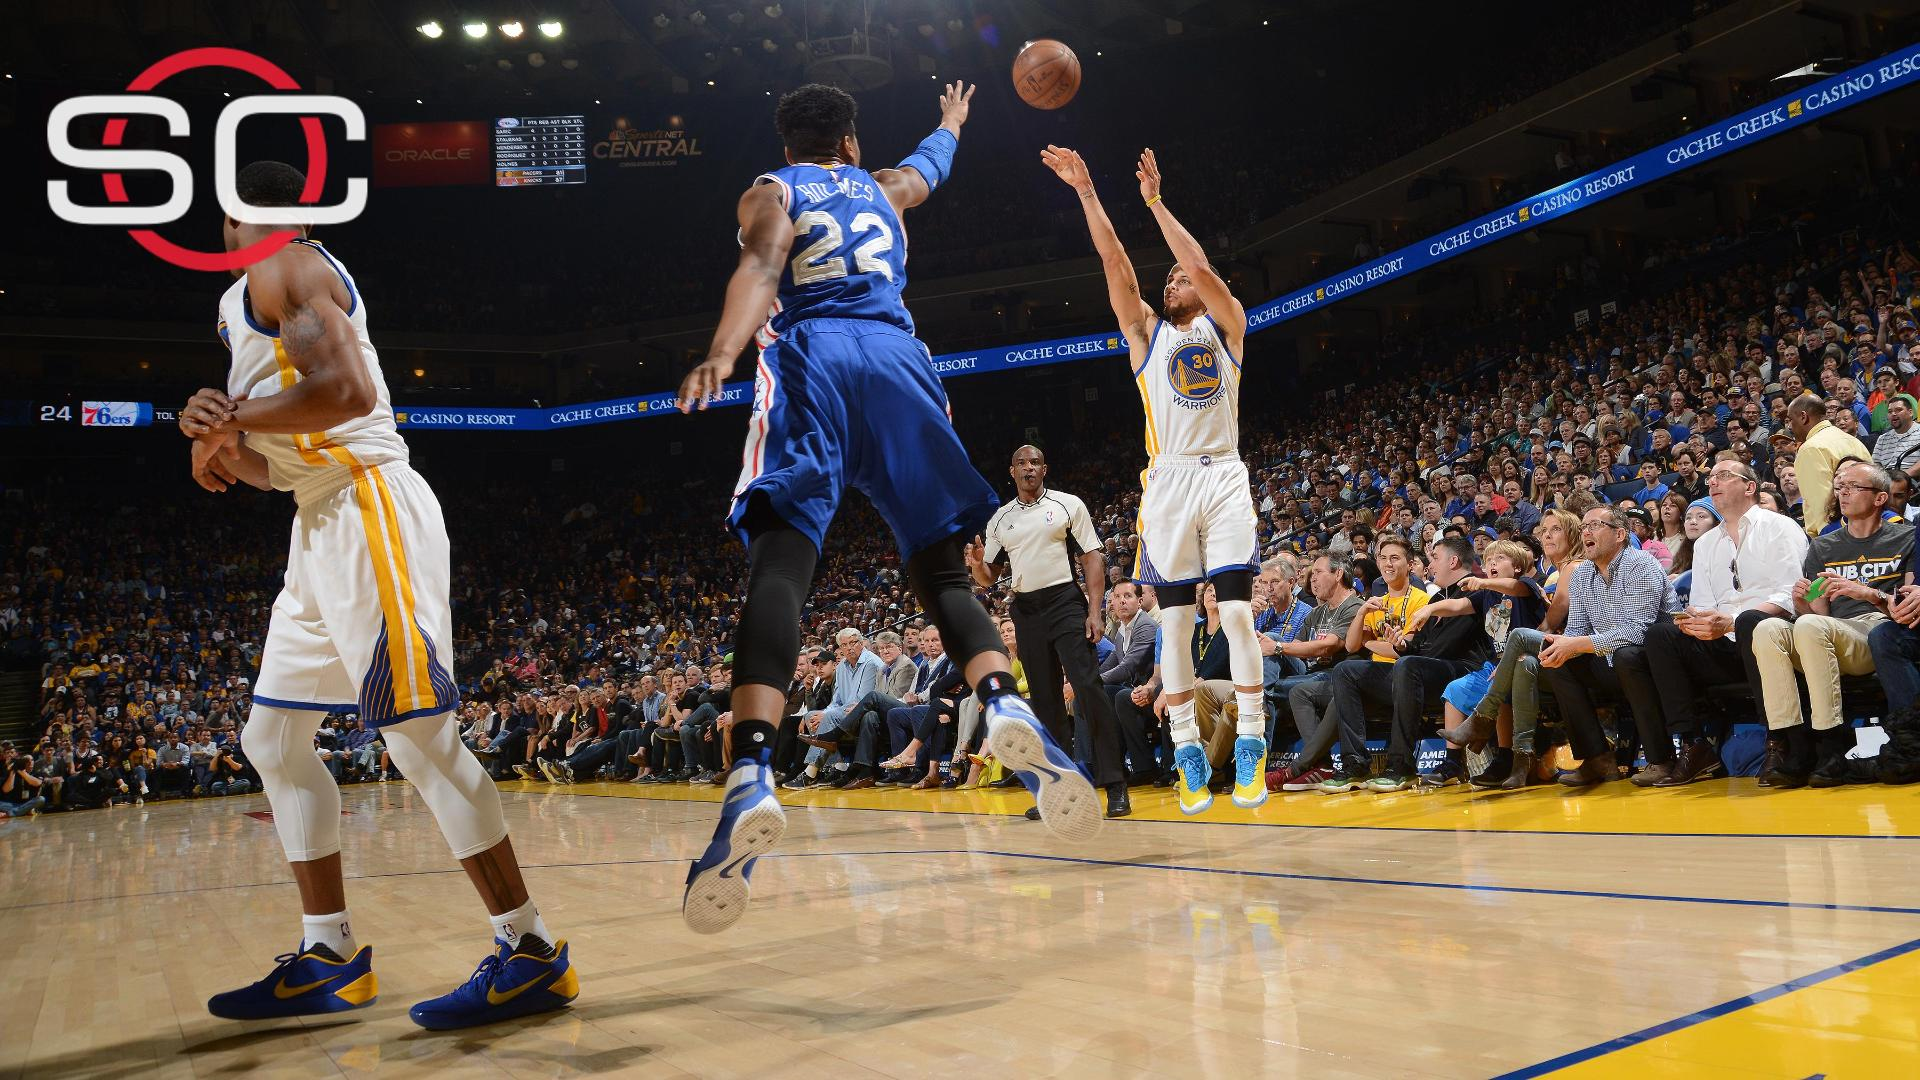 Blazers Vs Pelicans Game 1 Box Score   Priletai.com